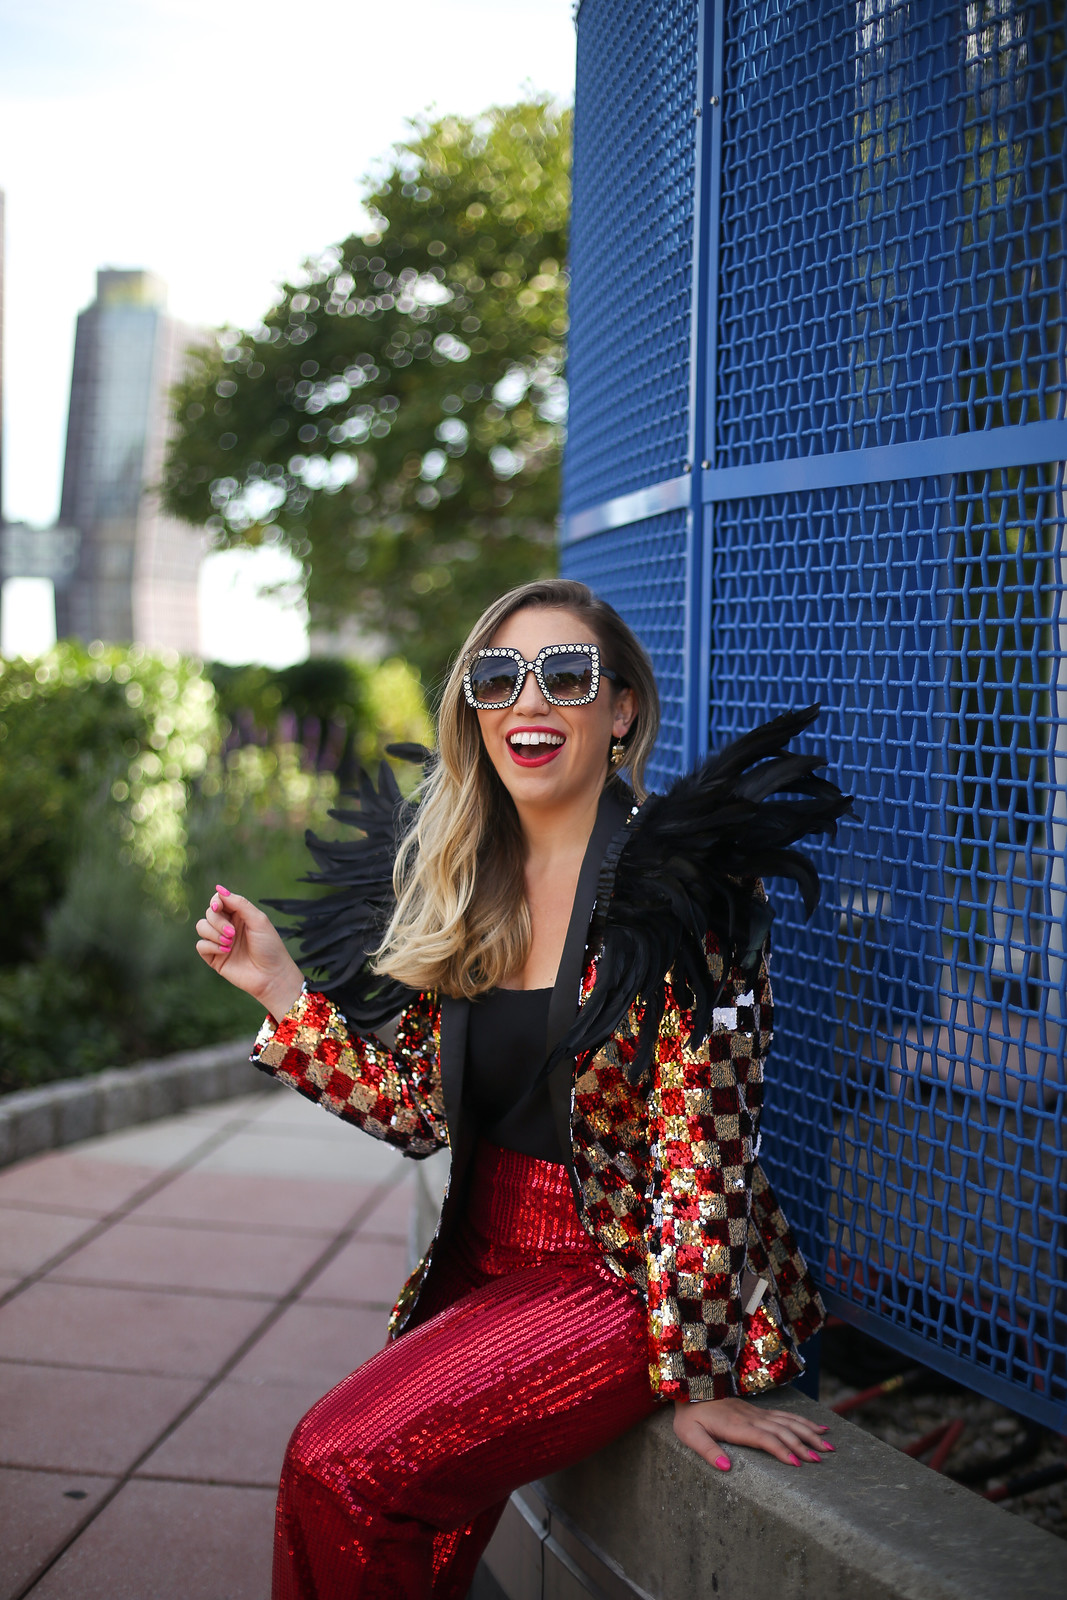 Group Halloween Costumes | Rock Legends | Legendary Rockstars | Elton John | Glam Sequin Costumes